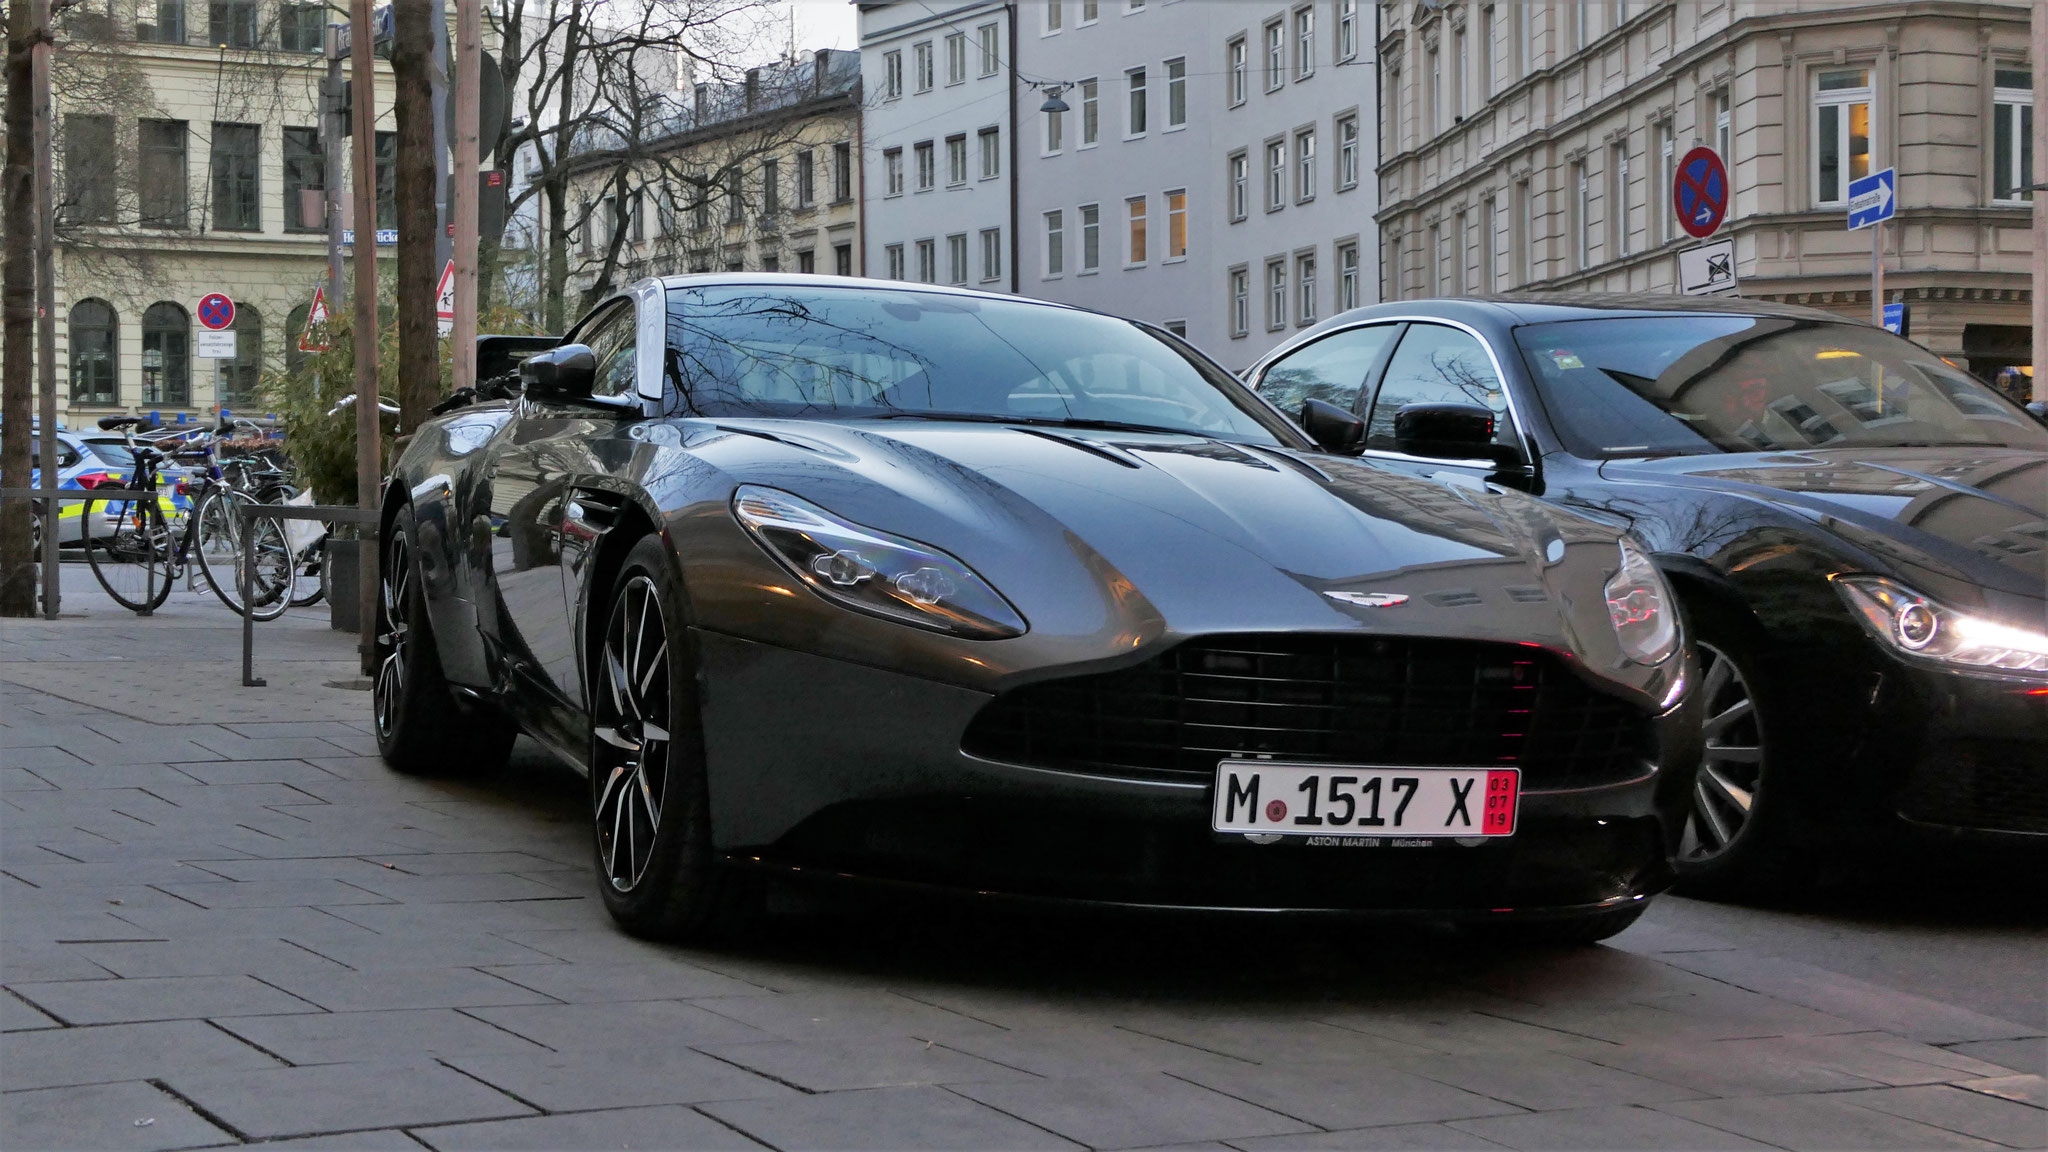 Aston Martin DB11 - M-1817-X